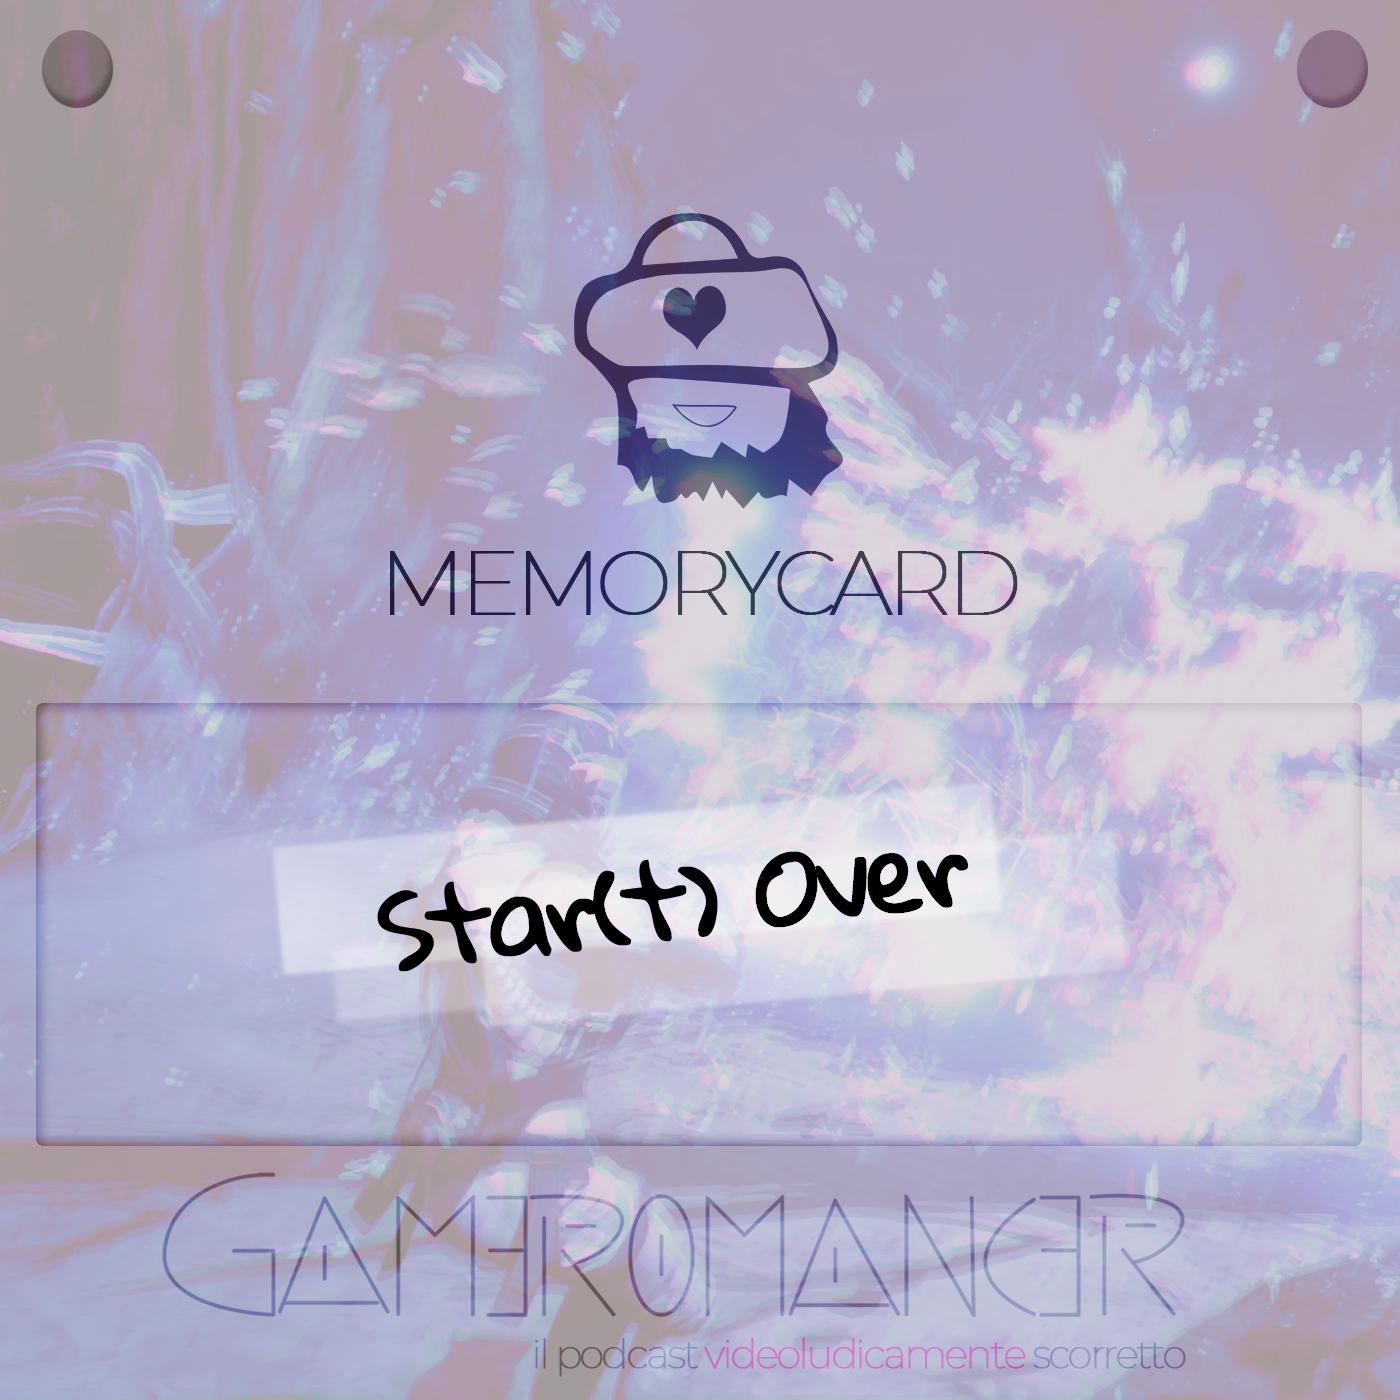 MemoryCard: Star(t) Over